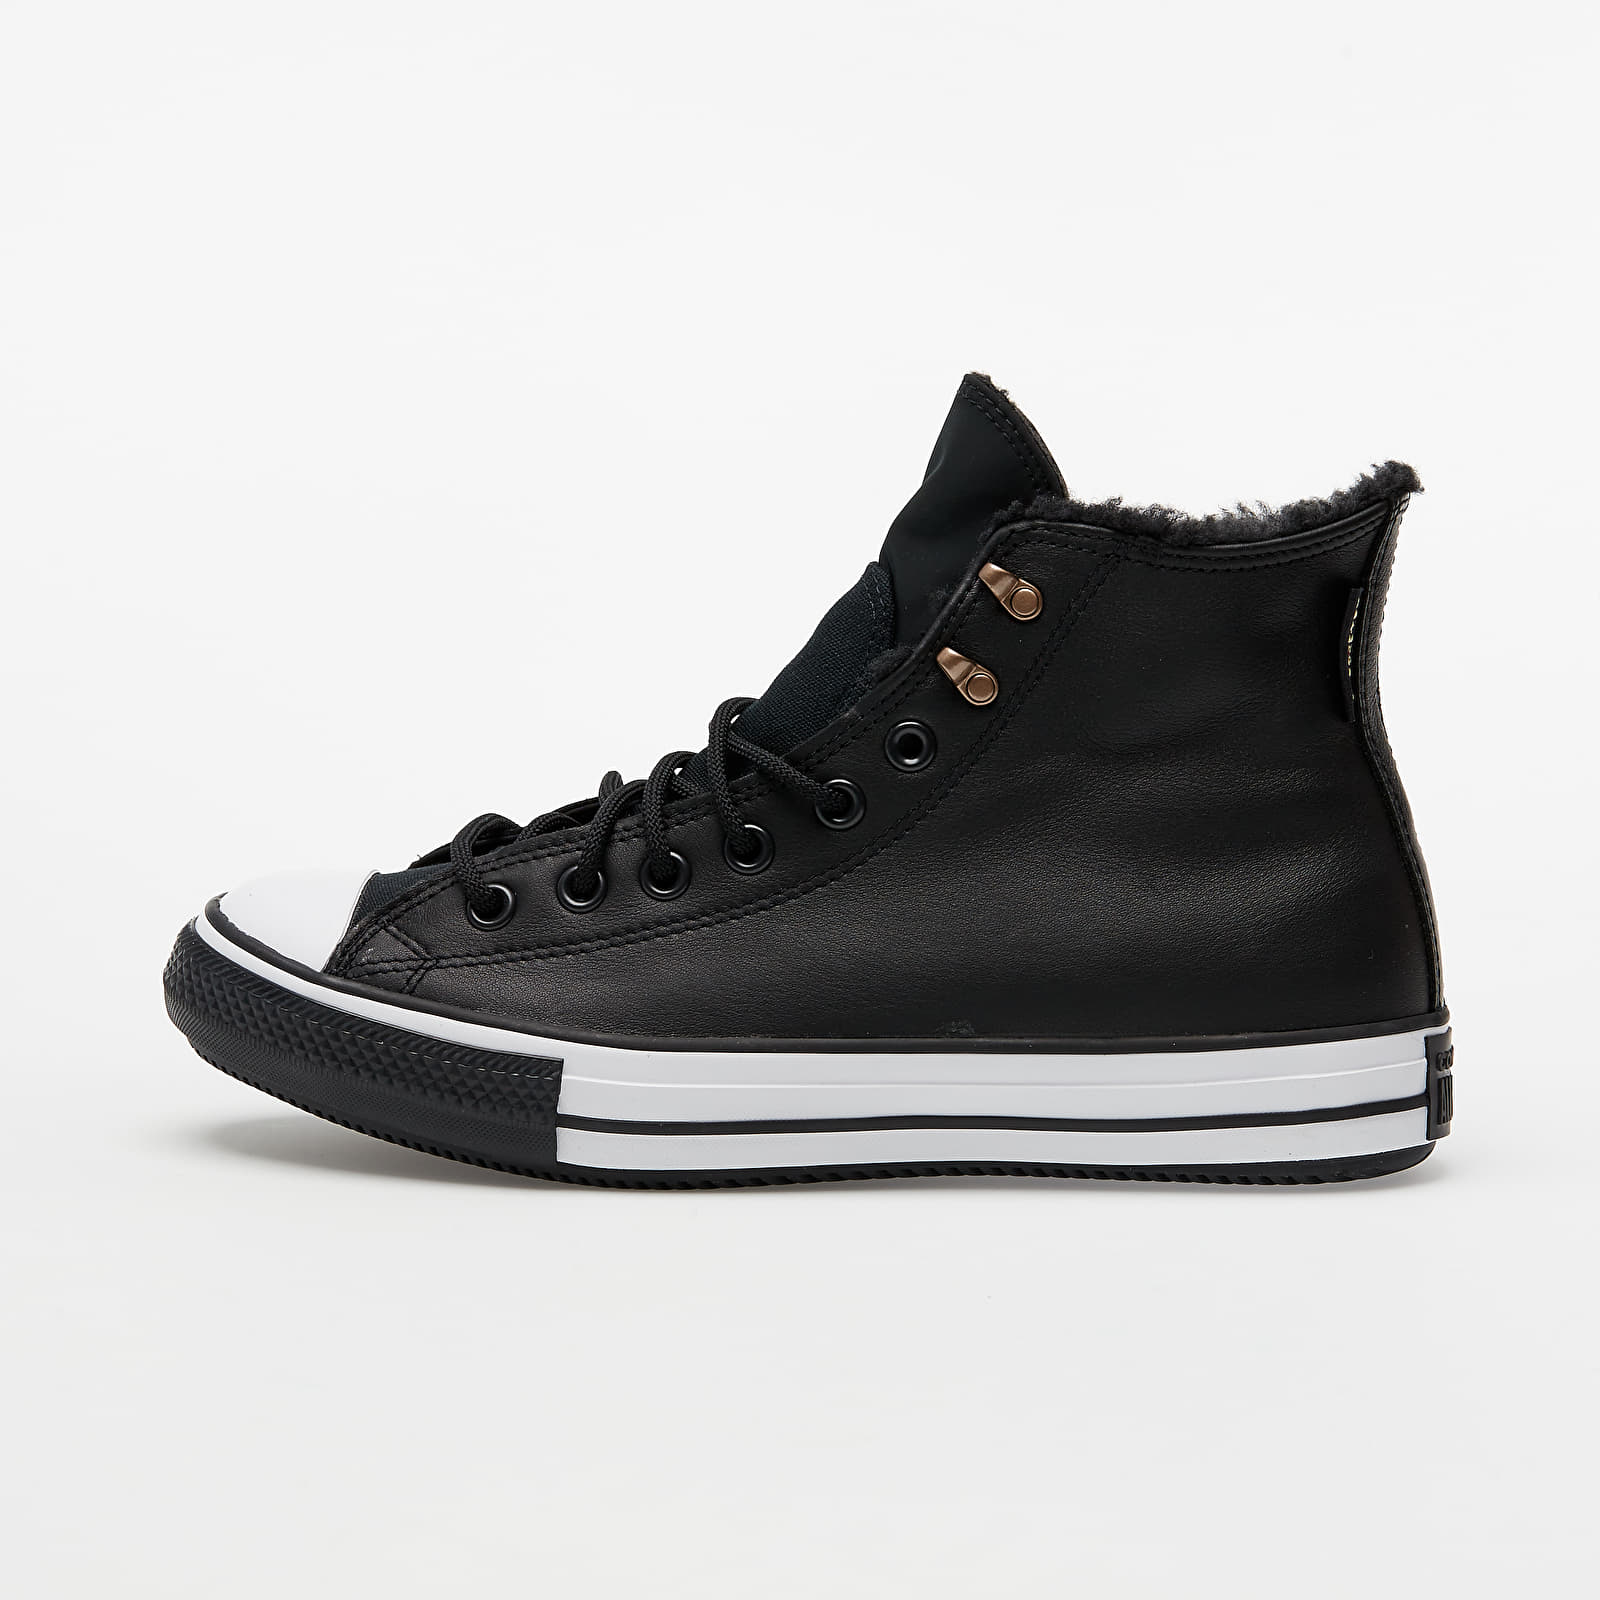 Converse Chuck Taylor All Star Winter Hi Black/ Black/ White 165936C